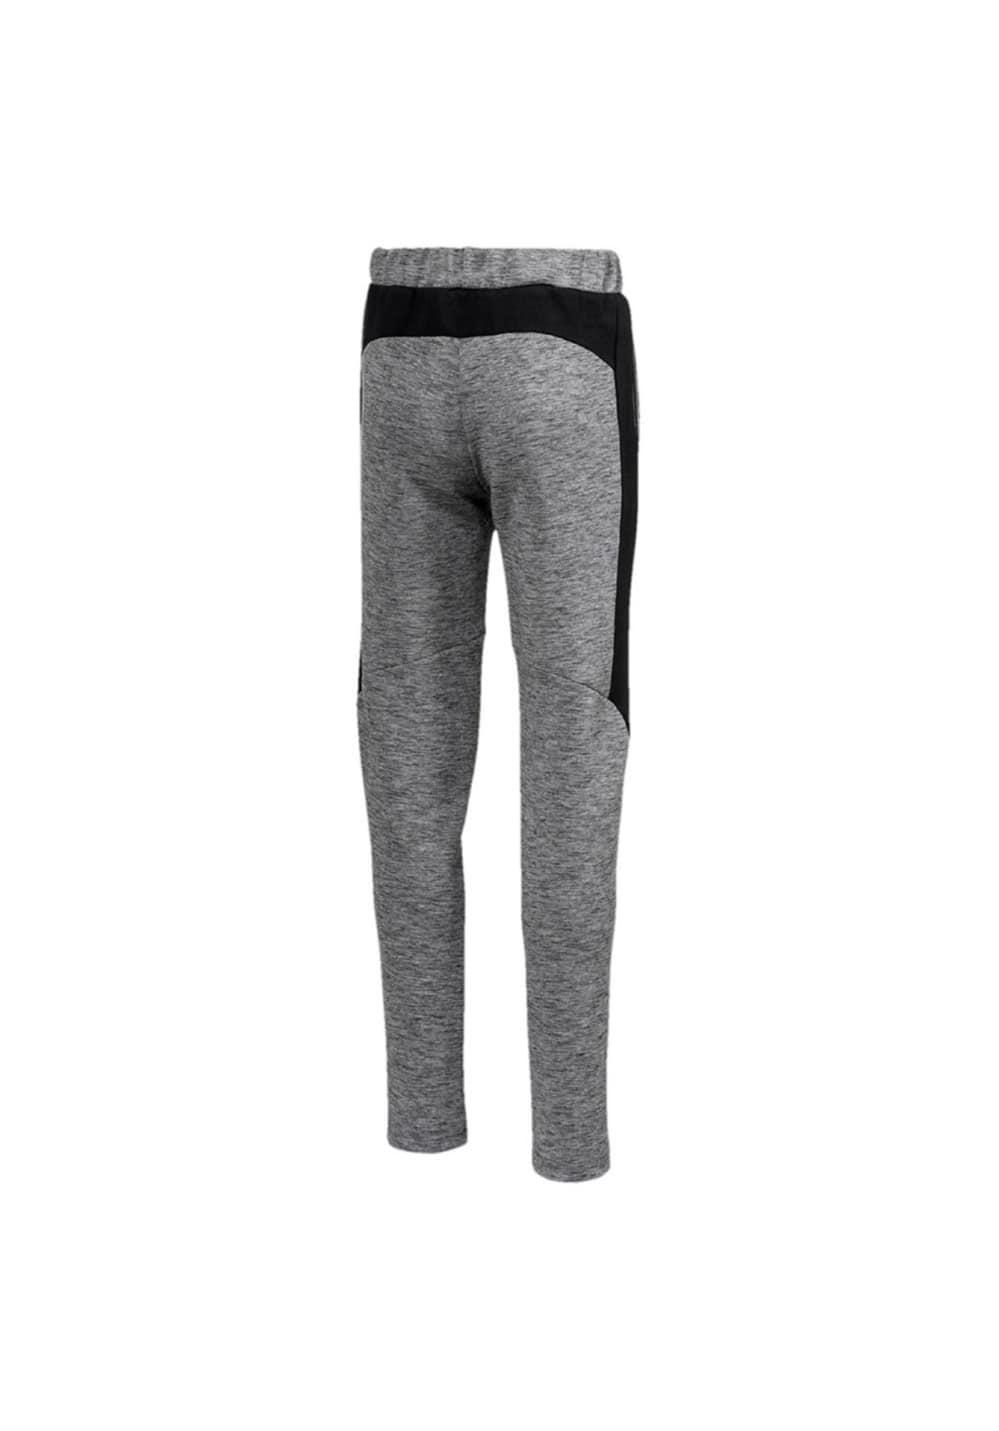 3f69fb321c4a Puma Evostripe Pants B - Fitness trousers for Boys - Grey